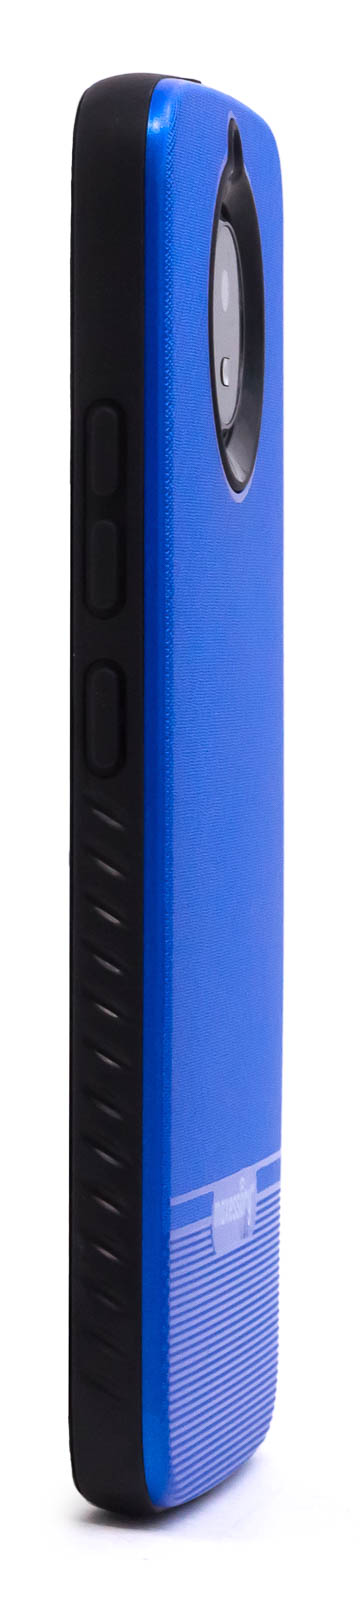 Moto-G5s-Case-Moto-G6-Case-Ultra-Thin-Hard-Body-Tactile-Shell-Cover thumbnail 9